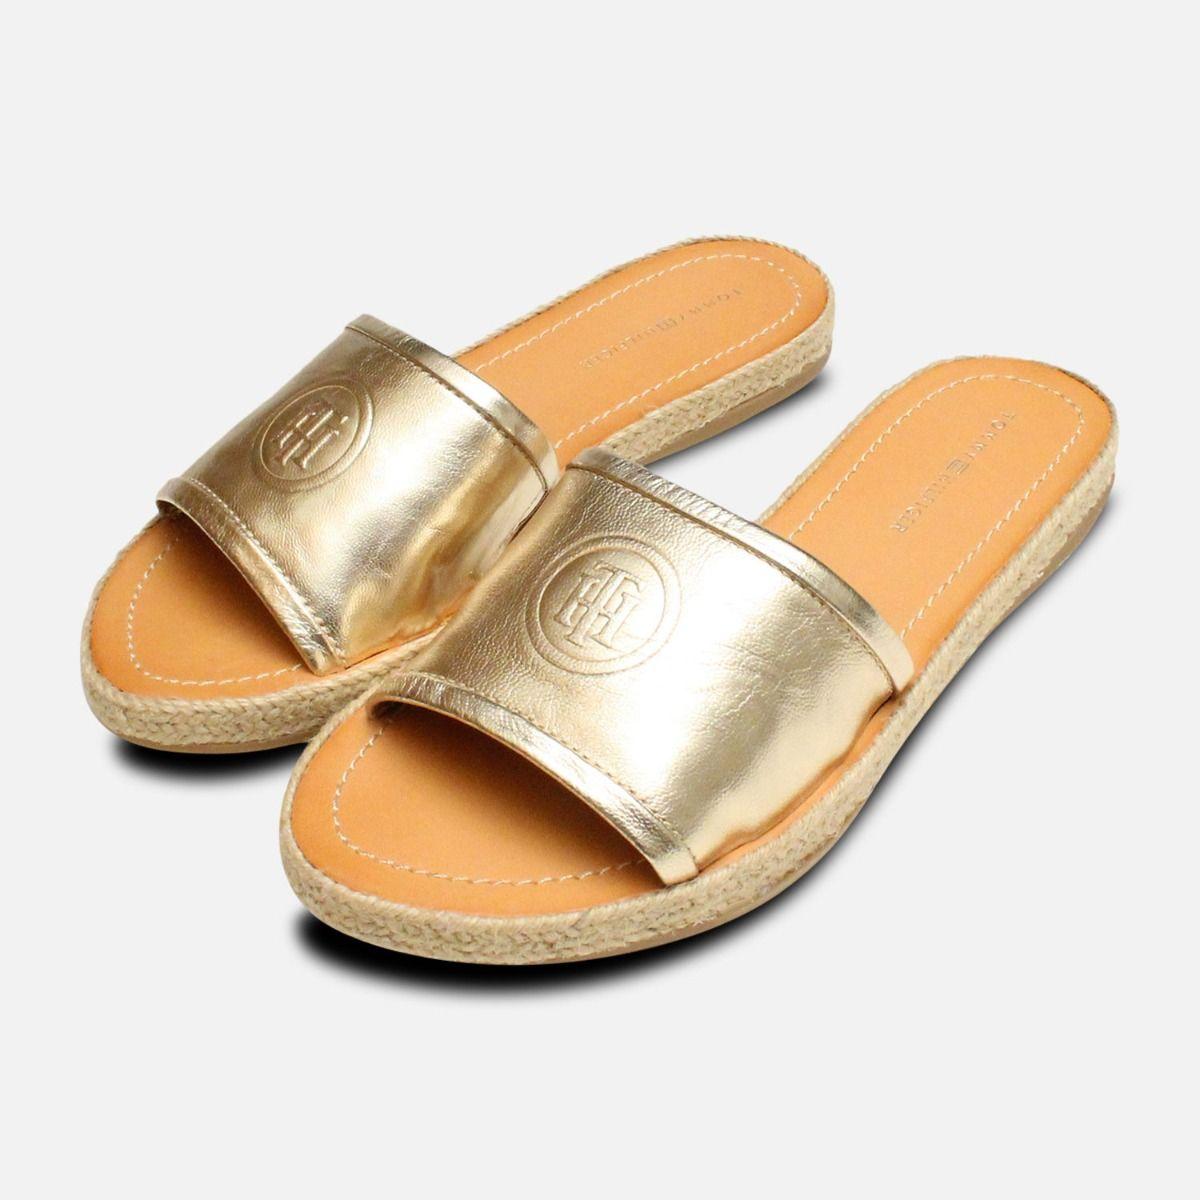 7b19ba5e8 Metallic Gold Leather Tommy Hilfiger Flat Mule Sandal